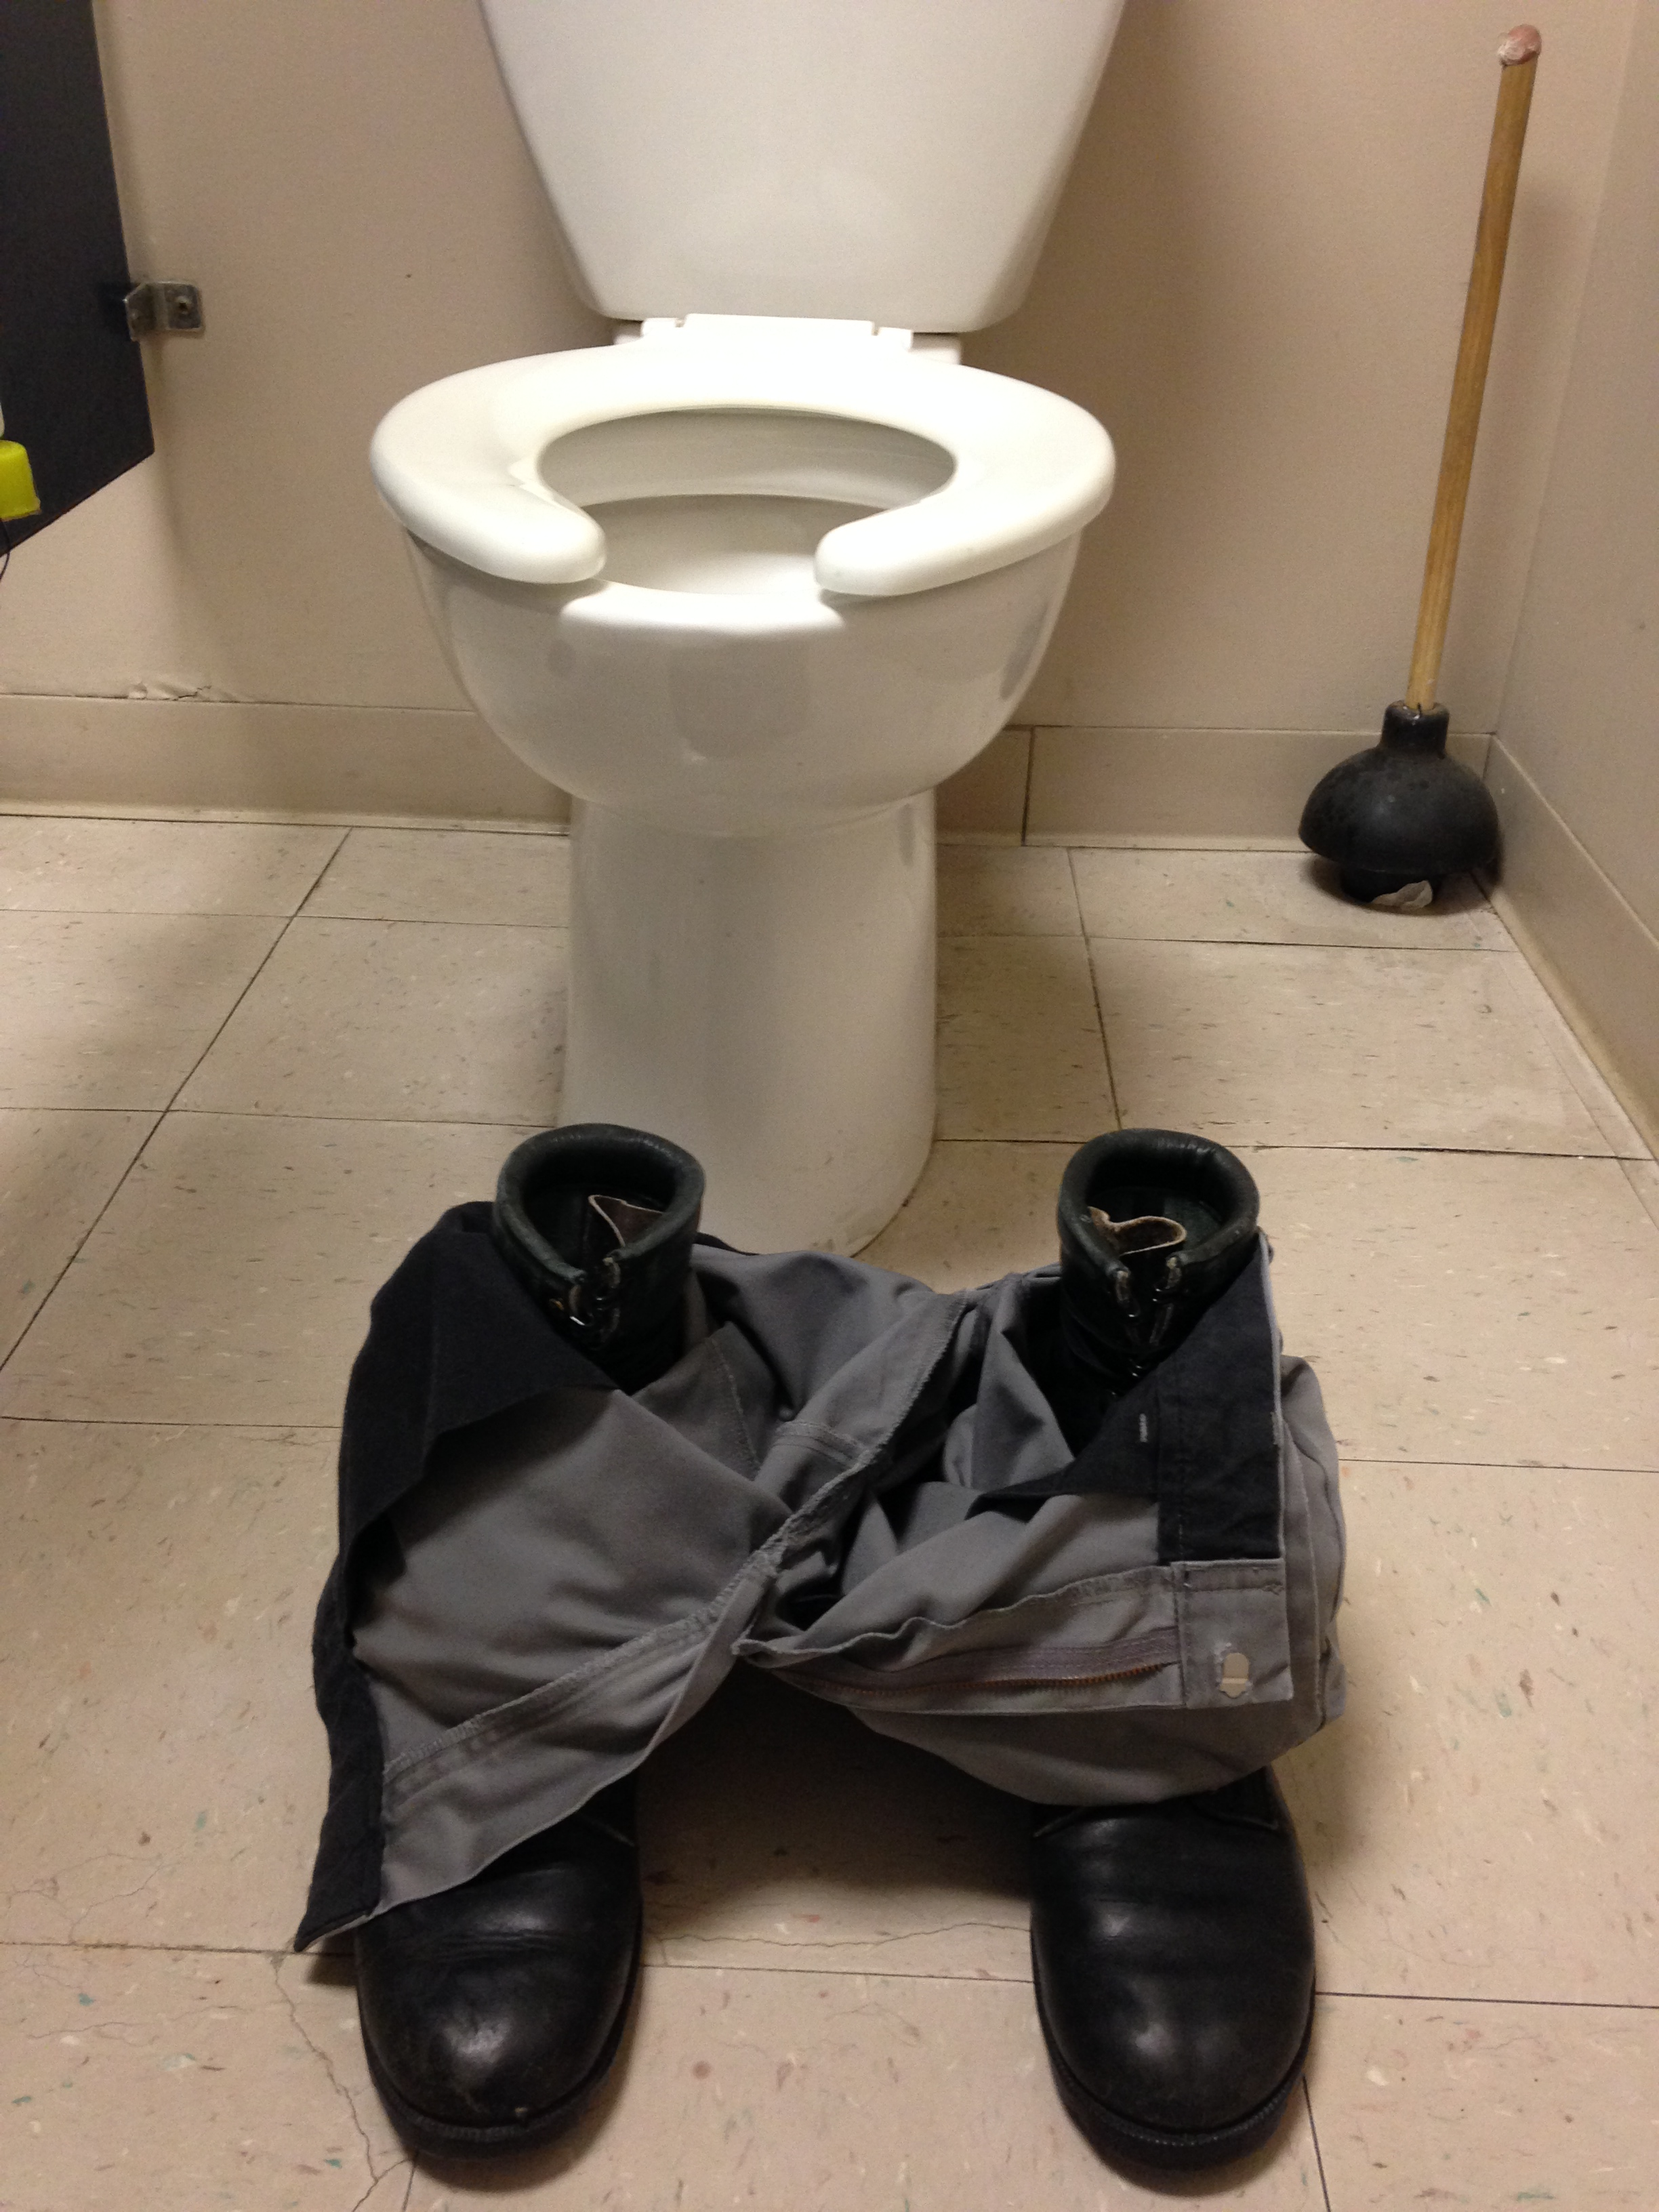 Arduino Fart-o-matic toilet humor prank